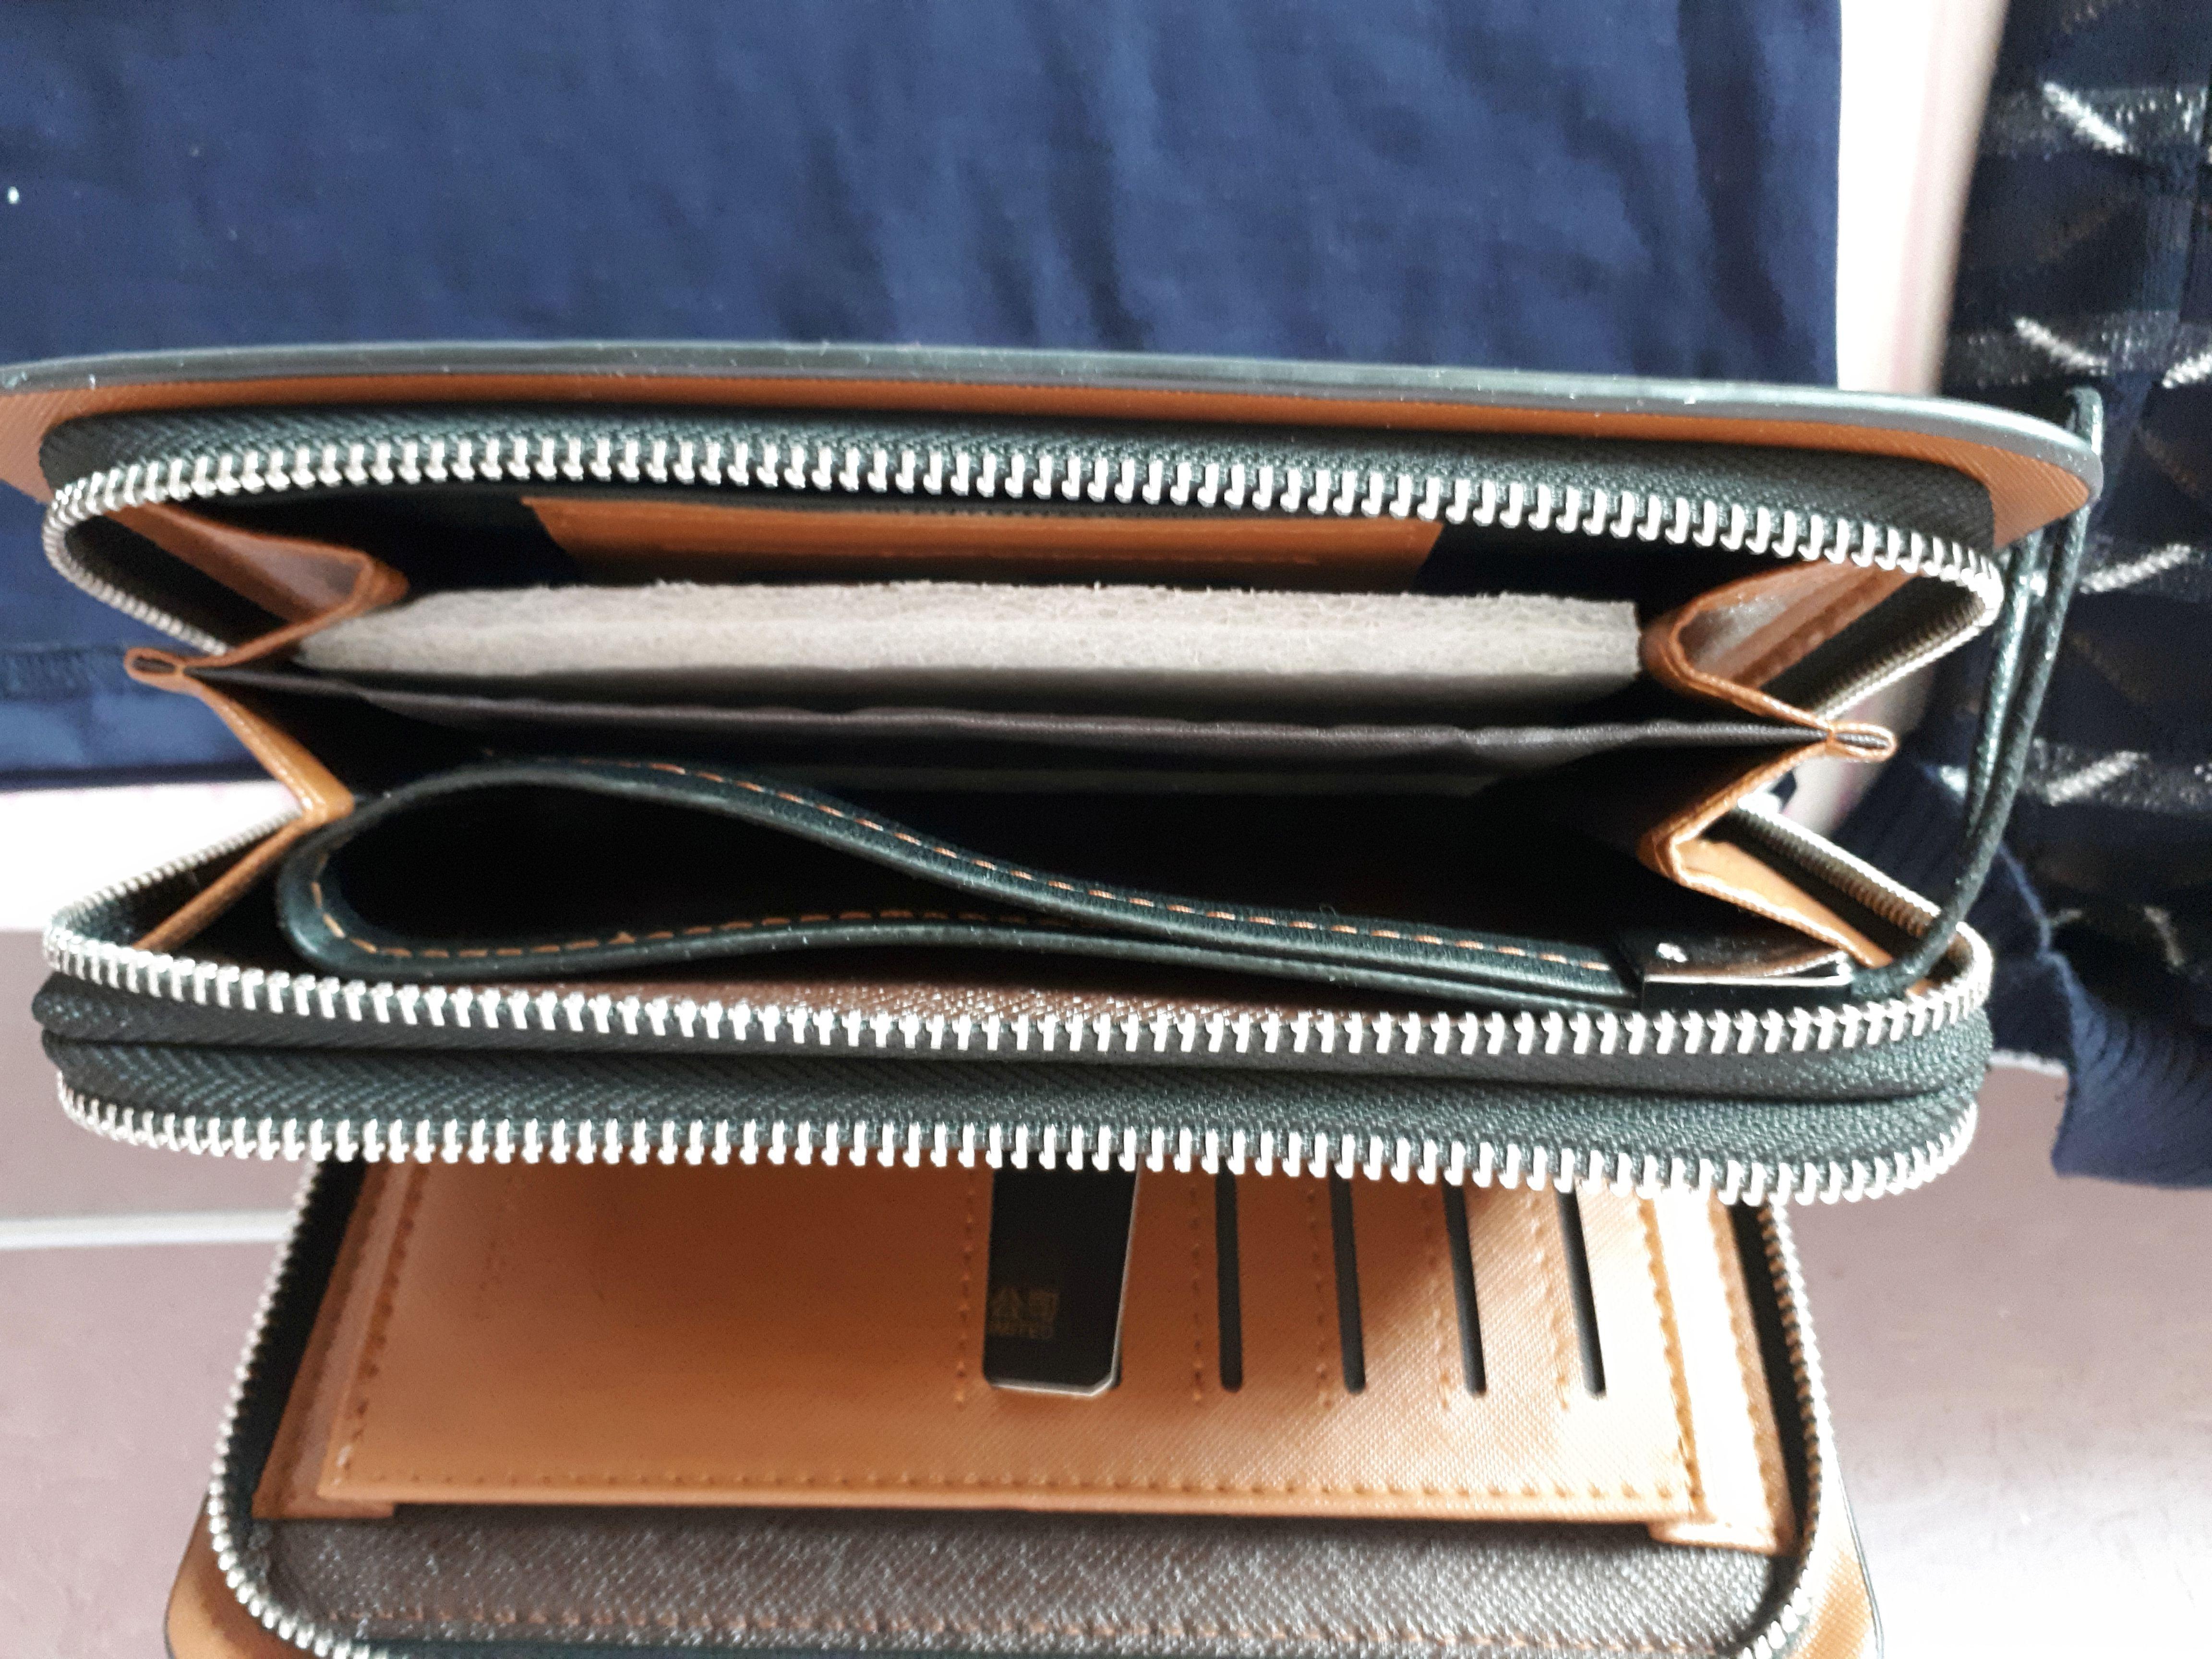 Bag Men's Clutch Wallet pu Men Wallets Double Zipper Male Wallet Solid Color Fashion Long Male Phone Wallet Man's Clutch Bags photo review